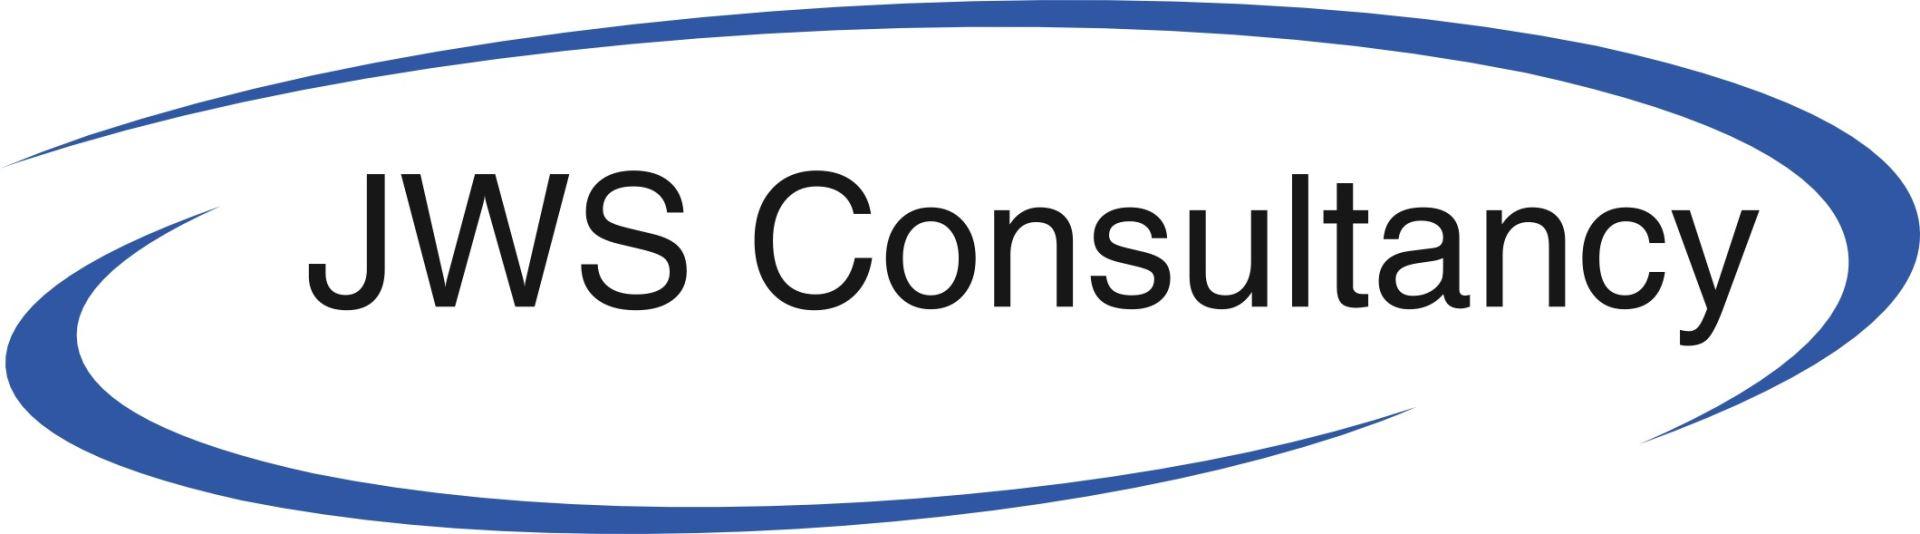 JWS Consultancy